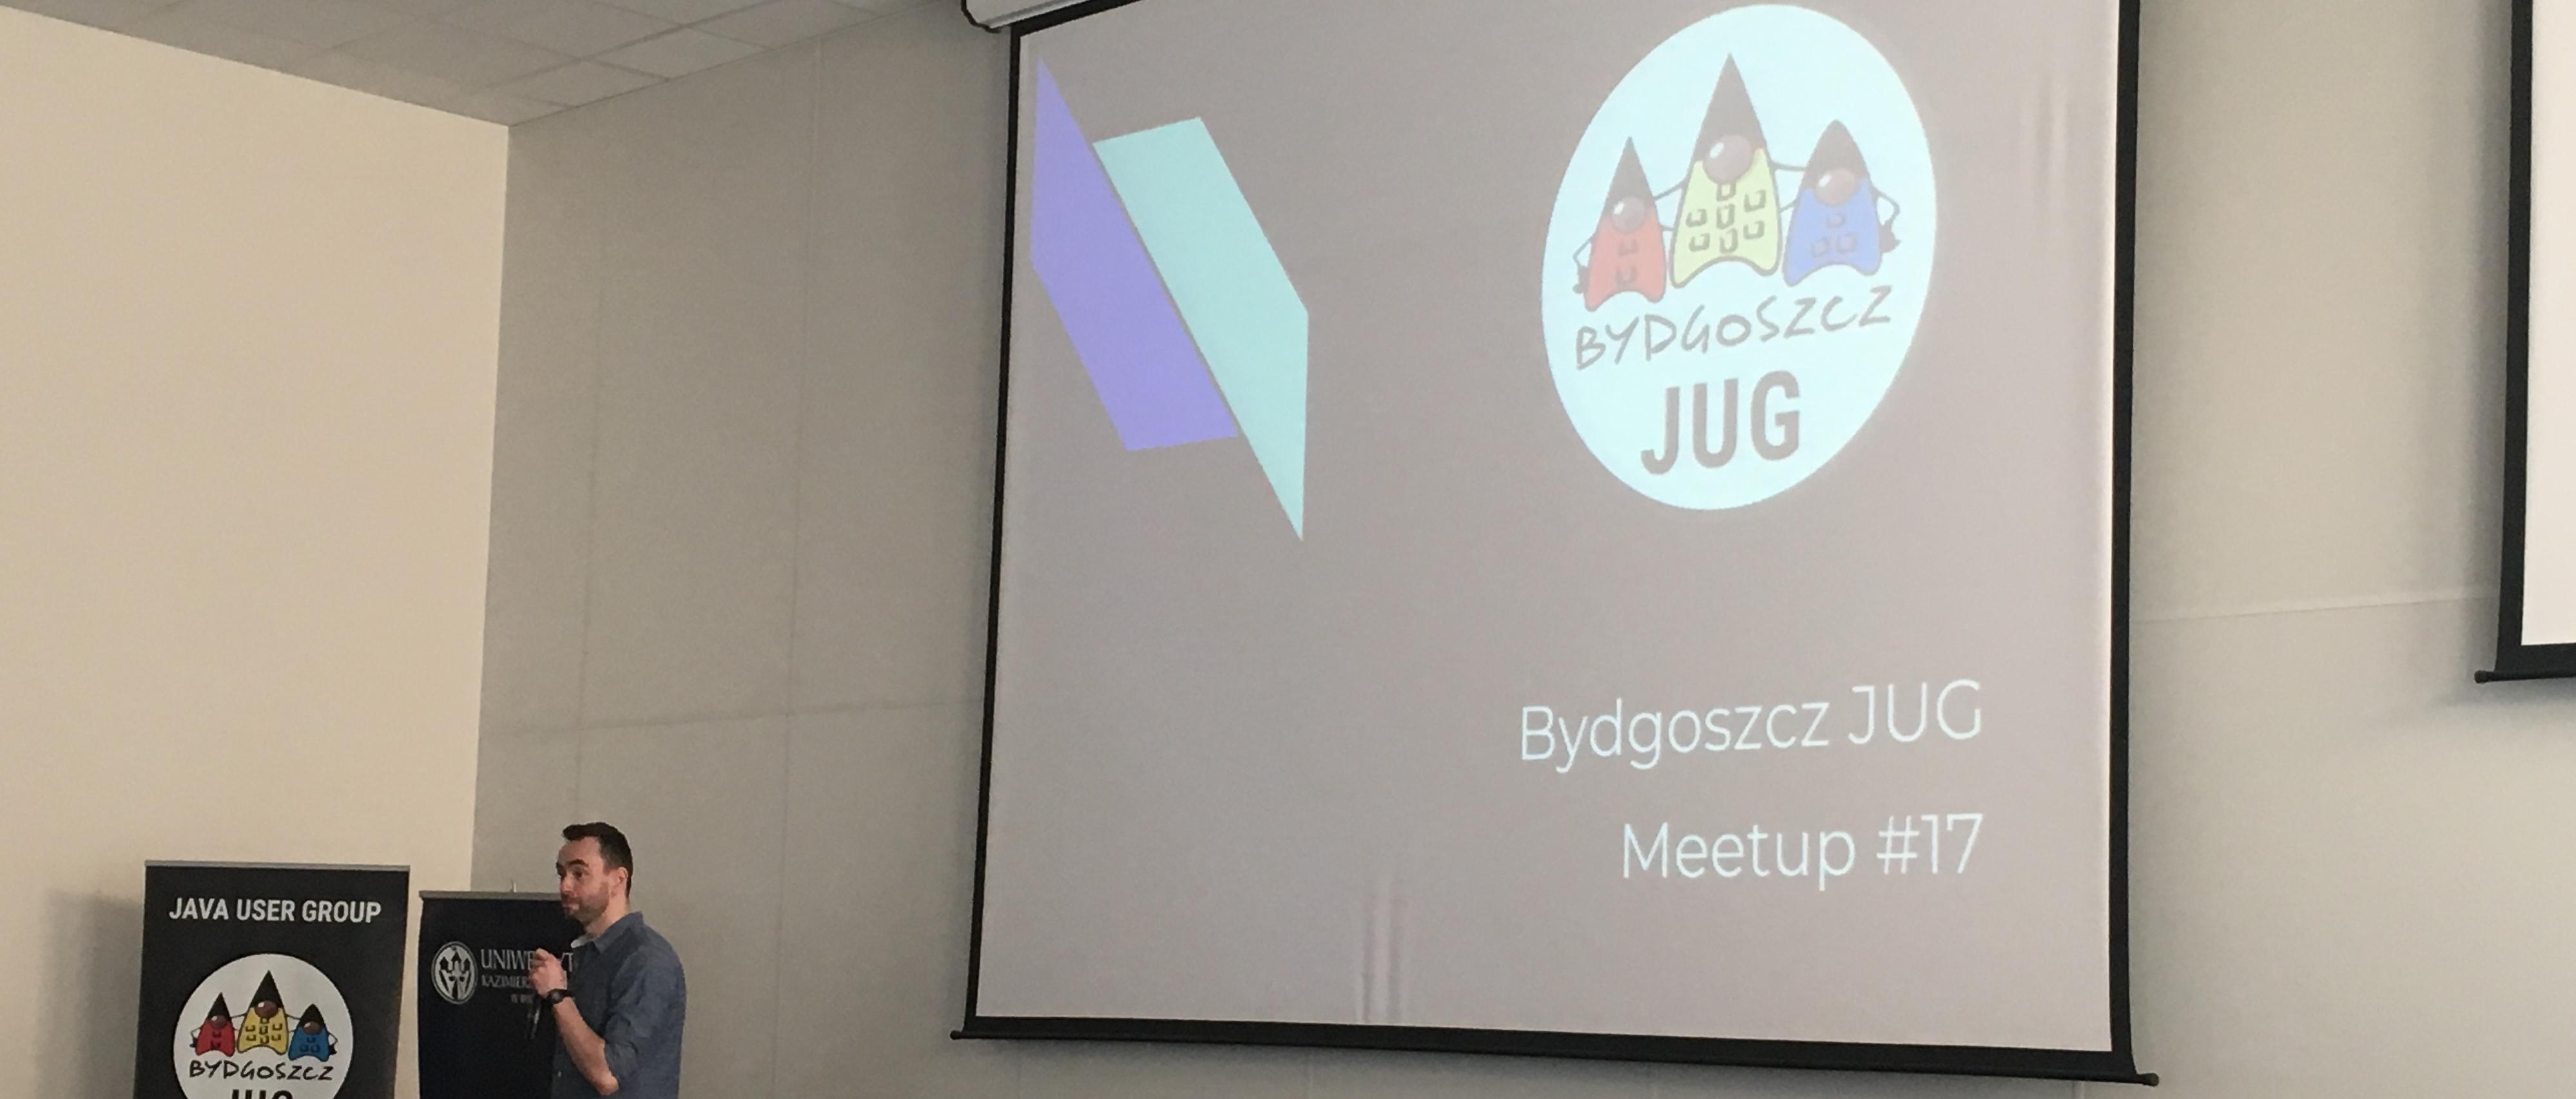 Bydgoszcz JUG – meetup #18